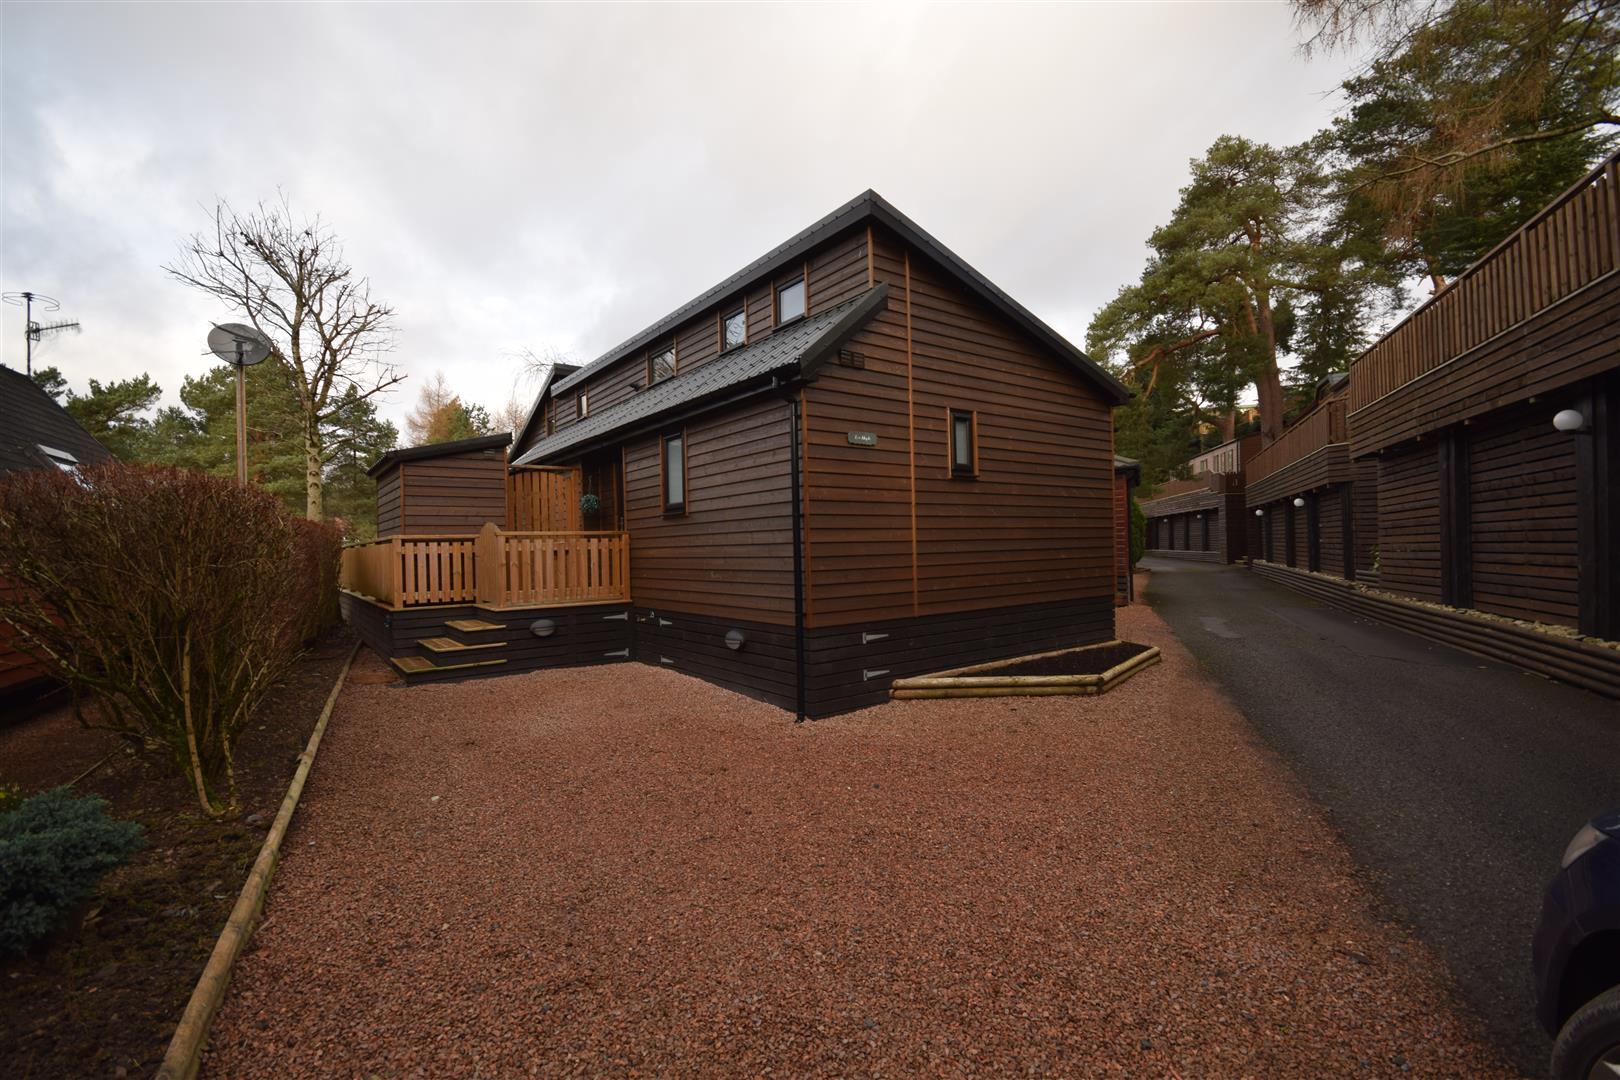 Les Maple, The Moorings, Rivertilt Leisure Park, Blair Atholl, Perthshire, PH18 5TE, UK